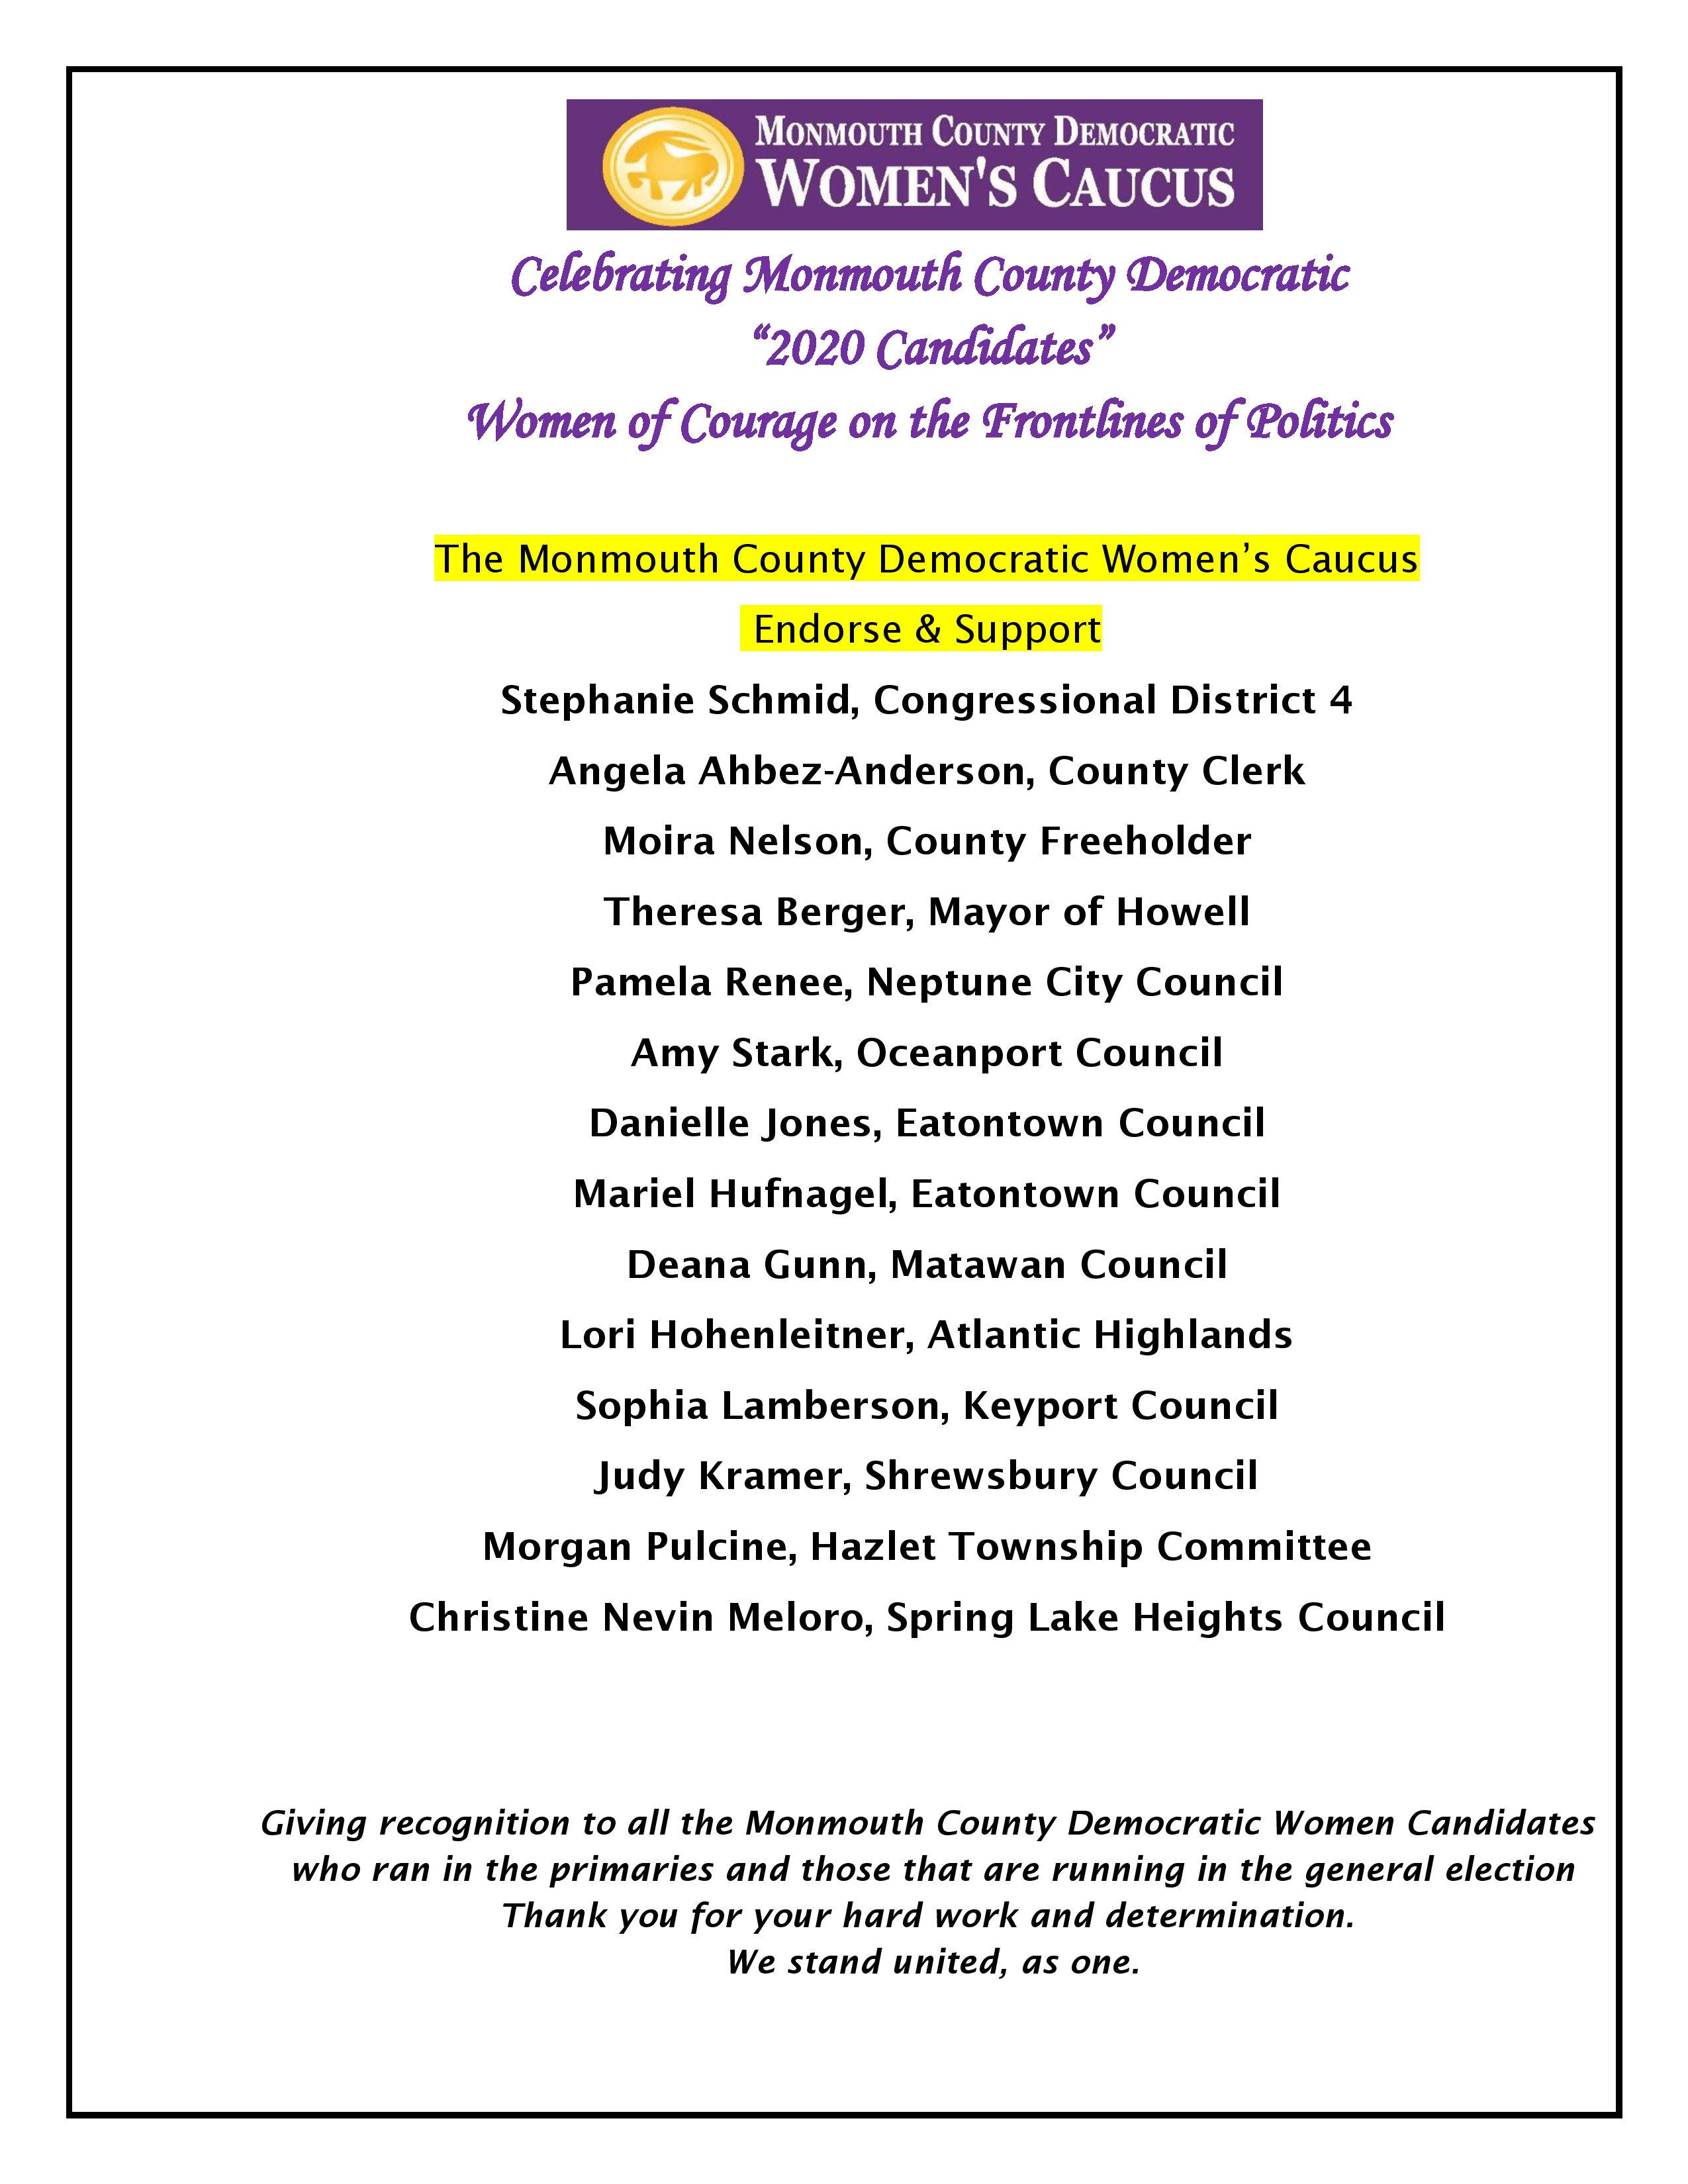 MCDWC_Candidate_List_2020.jpg